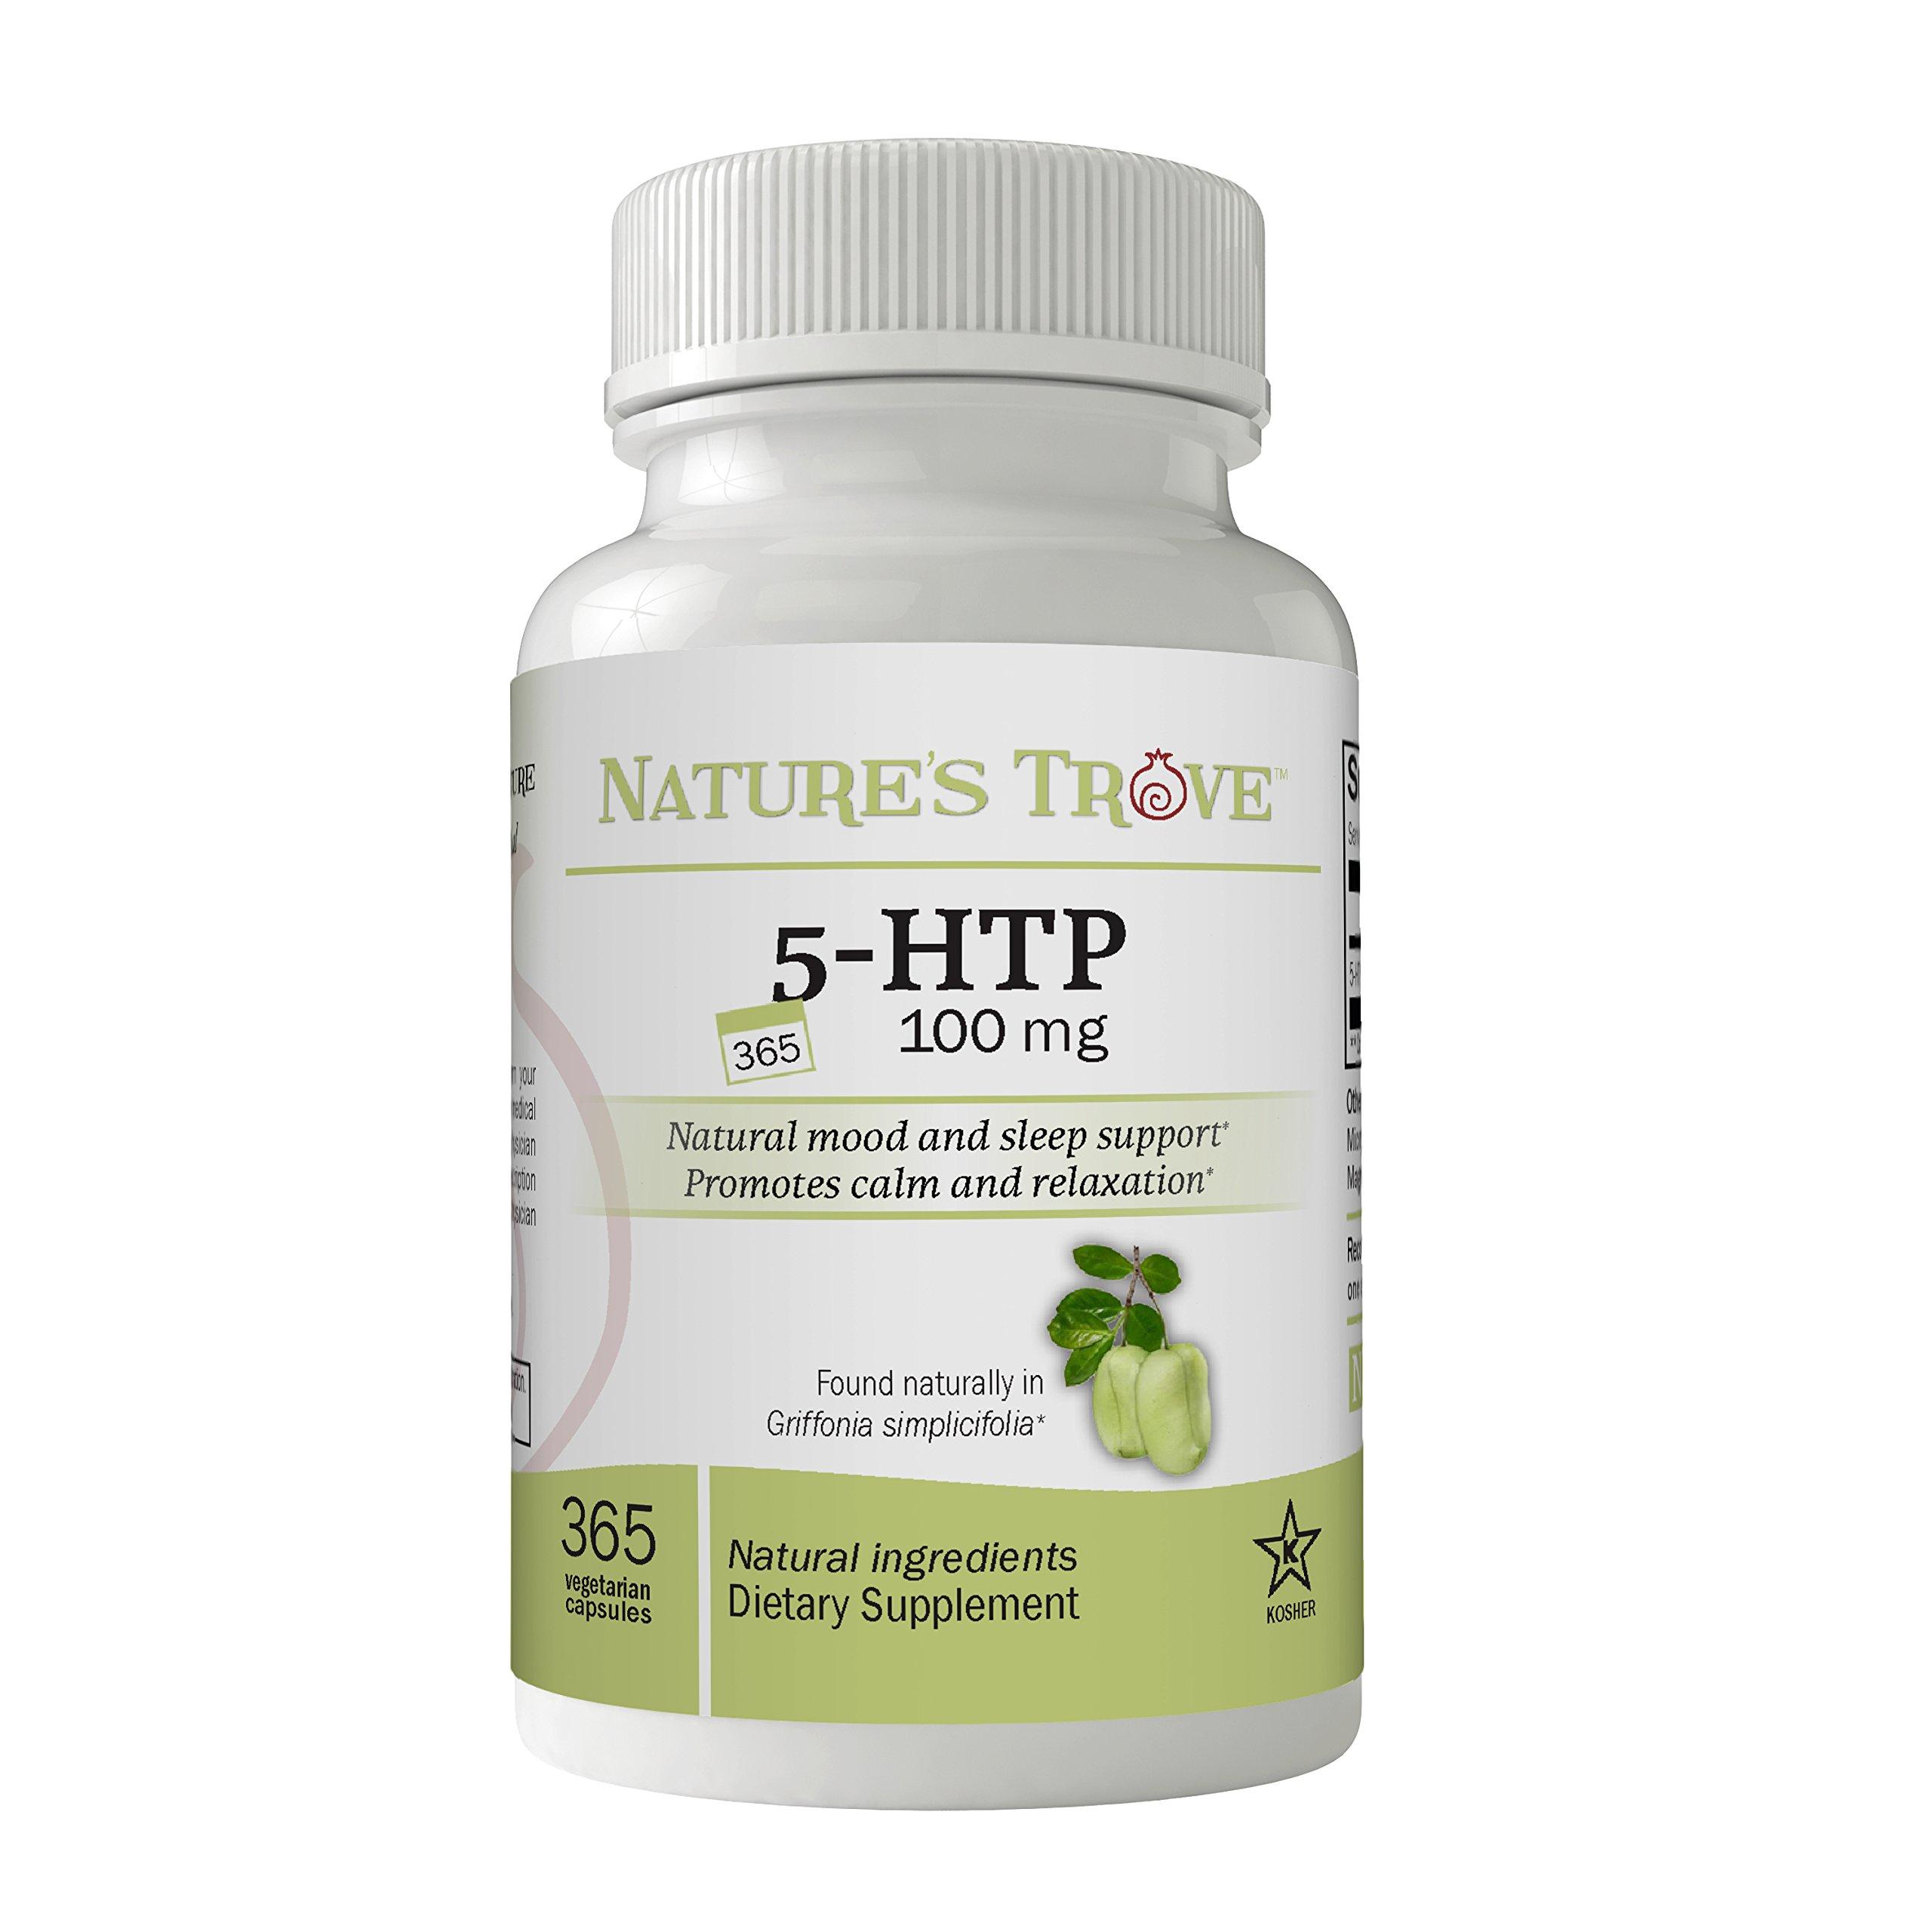 5-HTP 100 mg SUPER VALUE SIZE - 365 Vegetarian Capsules